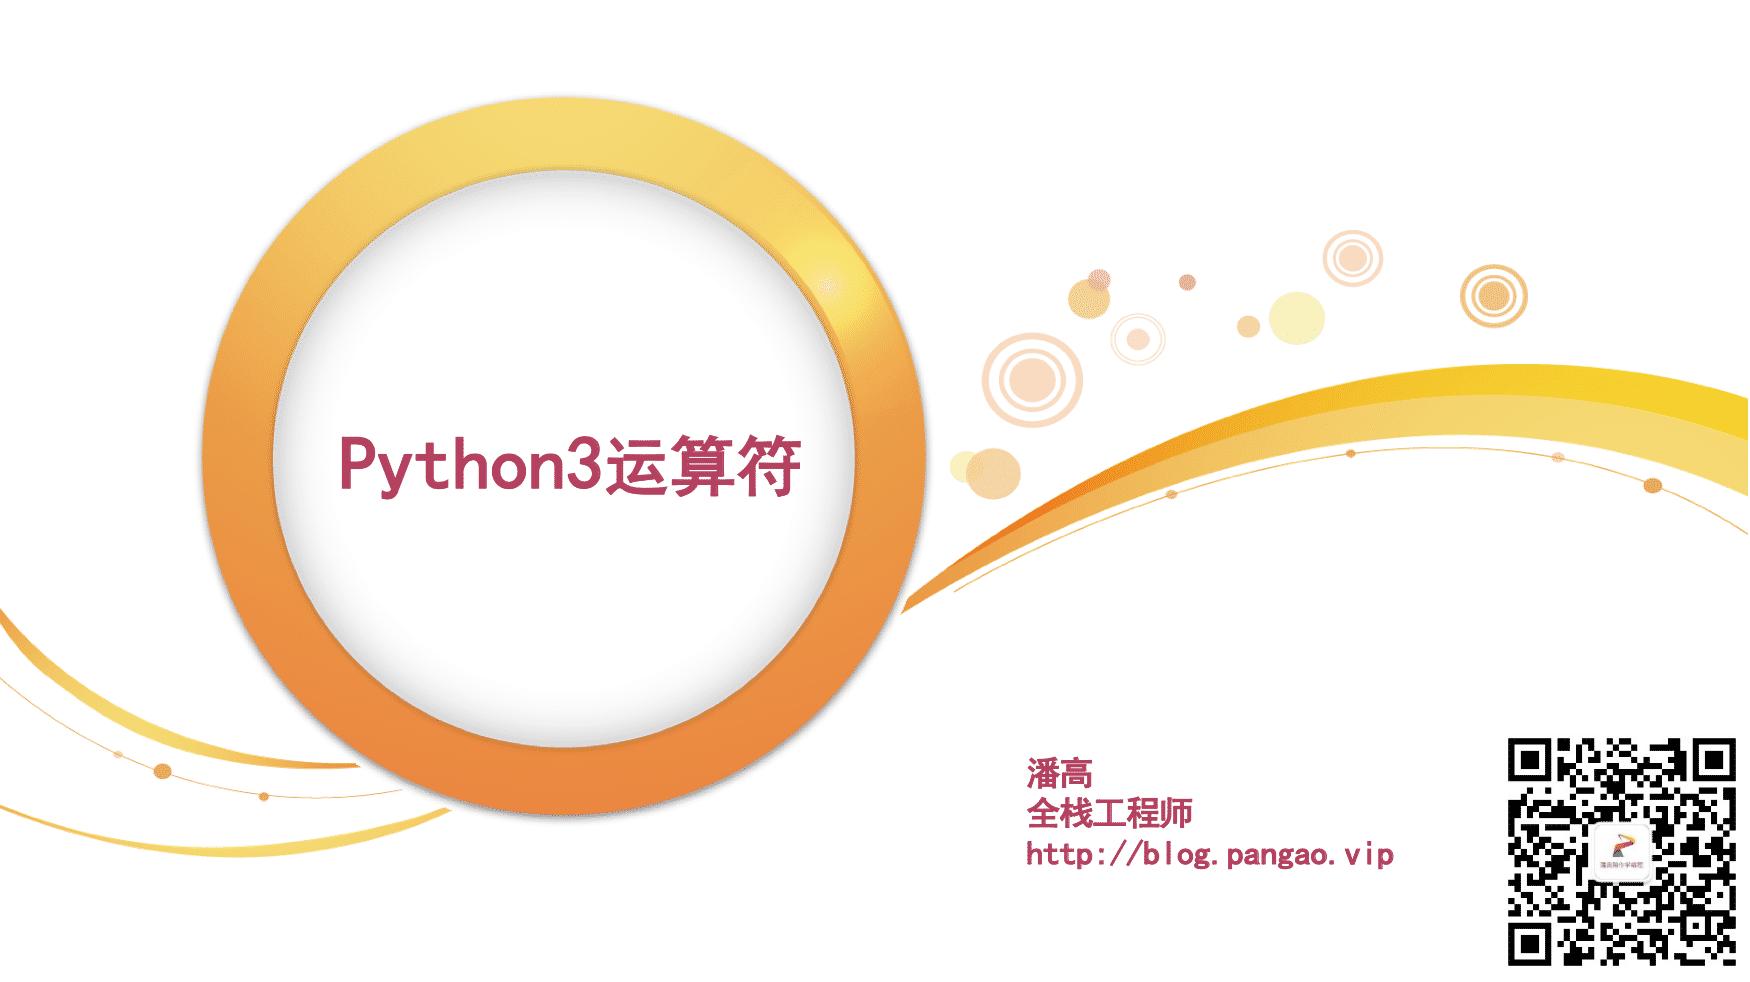 Python3运算符-Python入门到精通